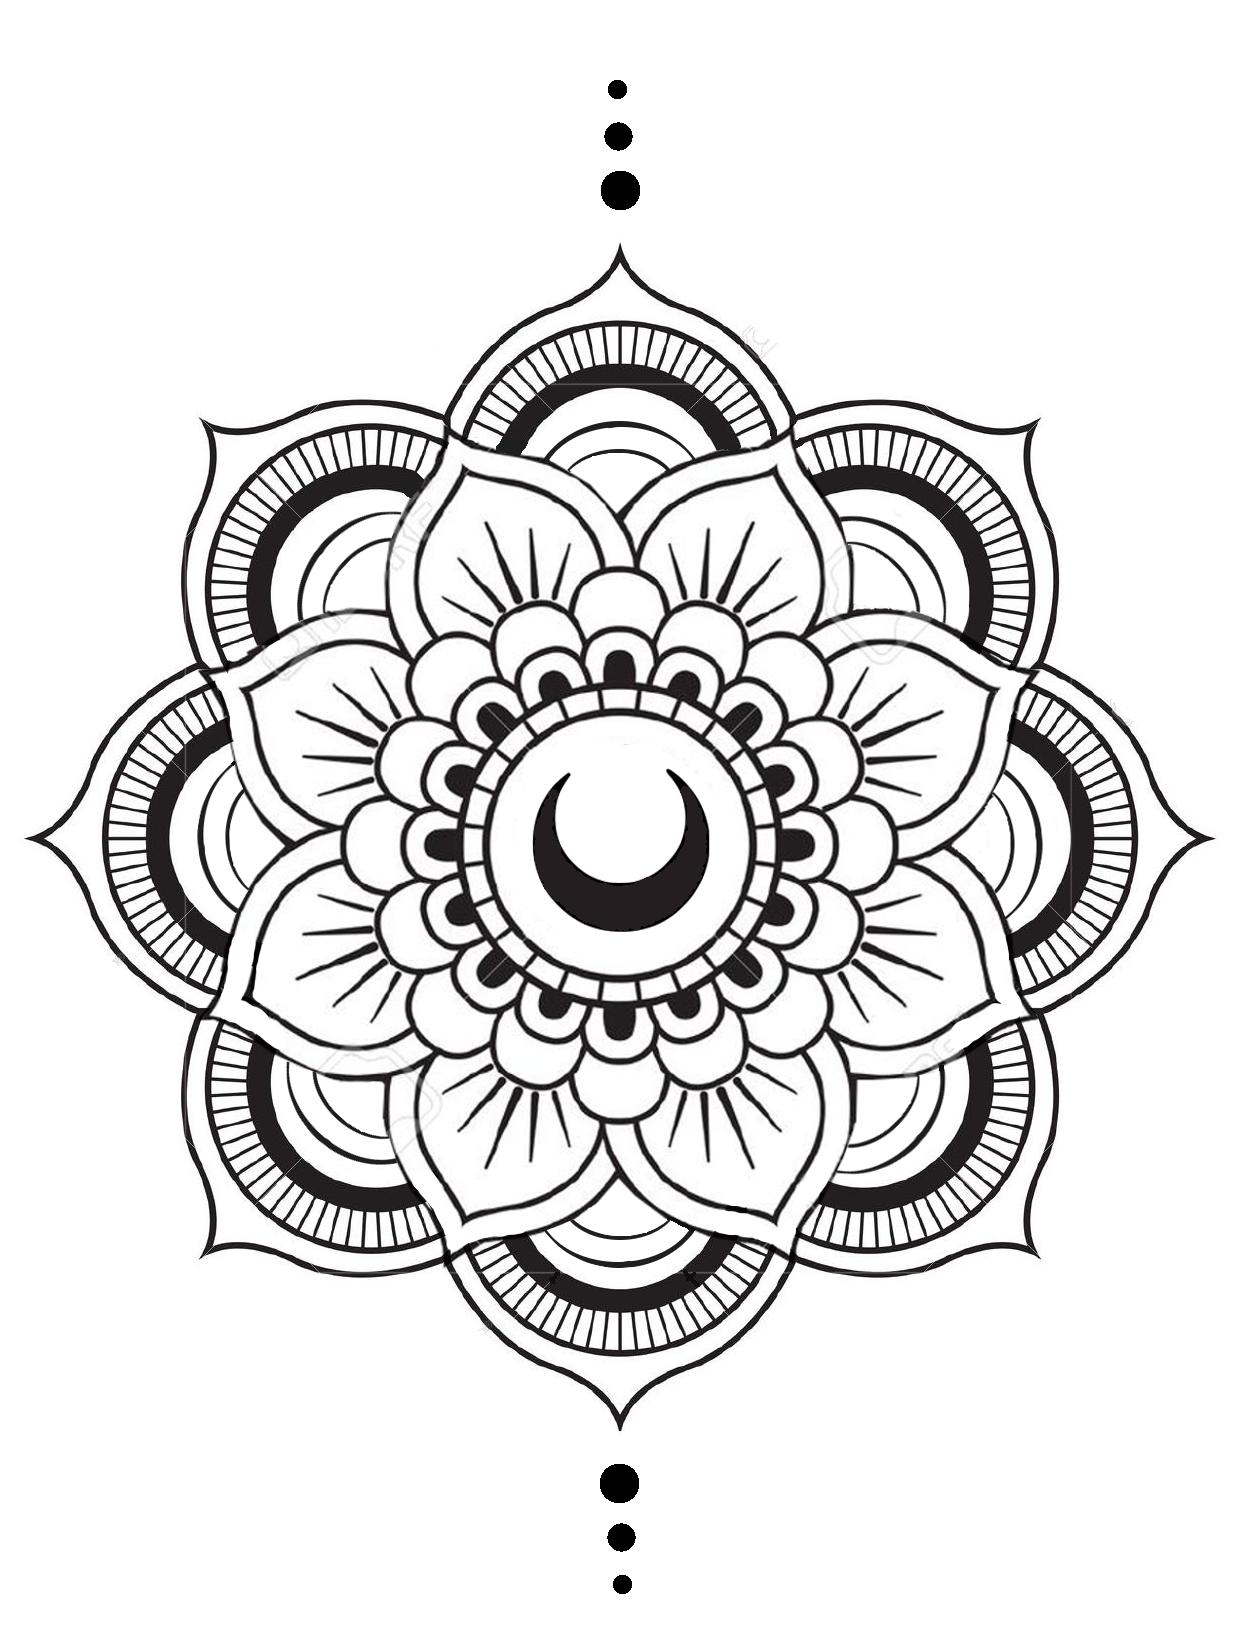 Proximo Tattoo Con Mi Mejor Amiga Mandala Moon Tattoo Bff